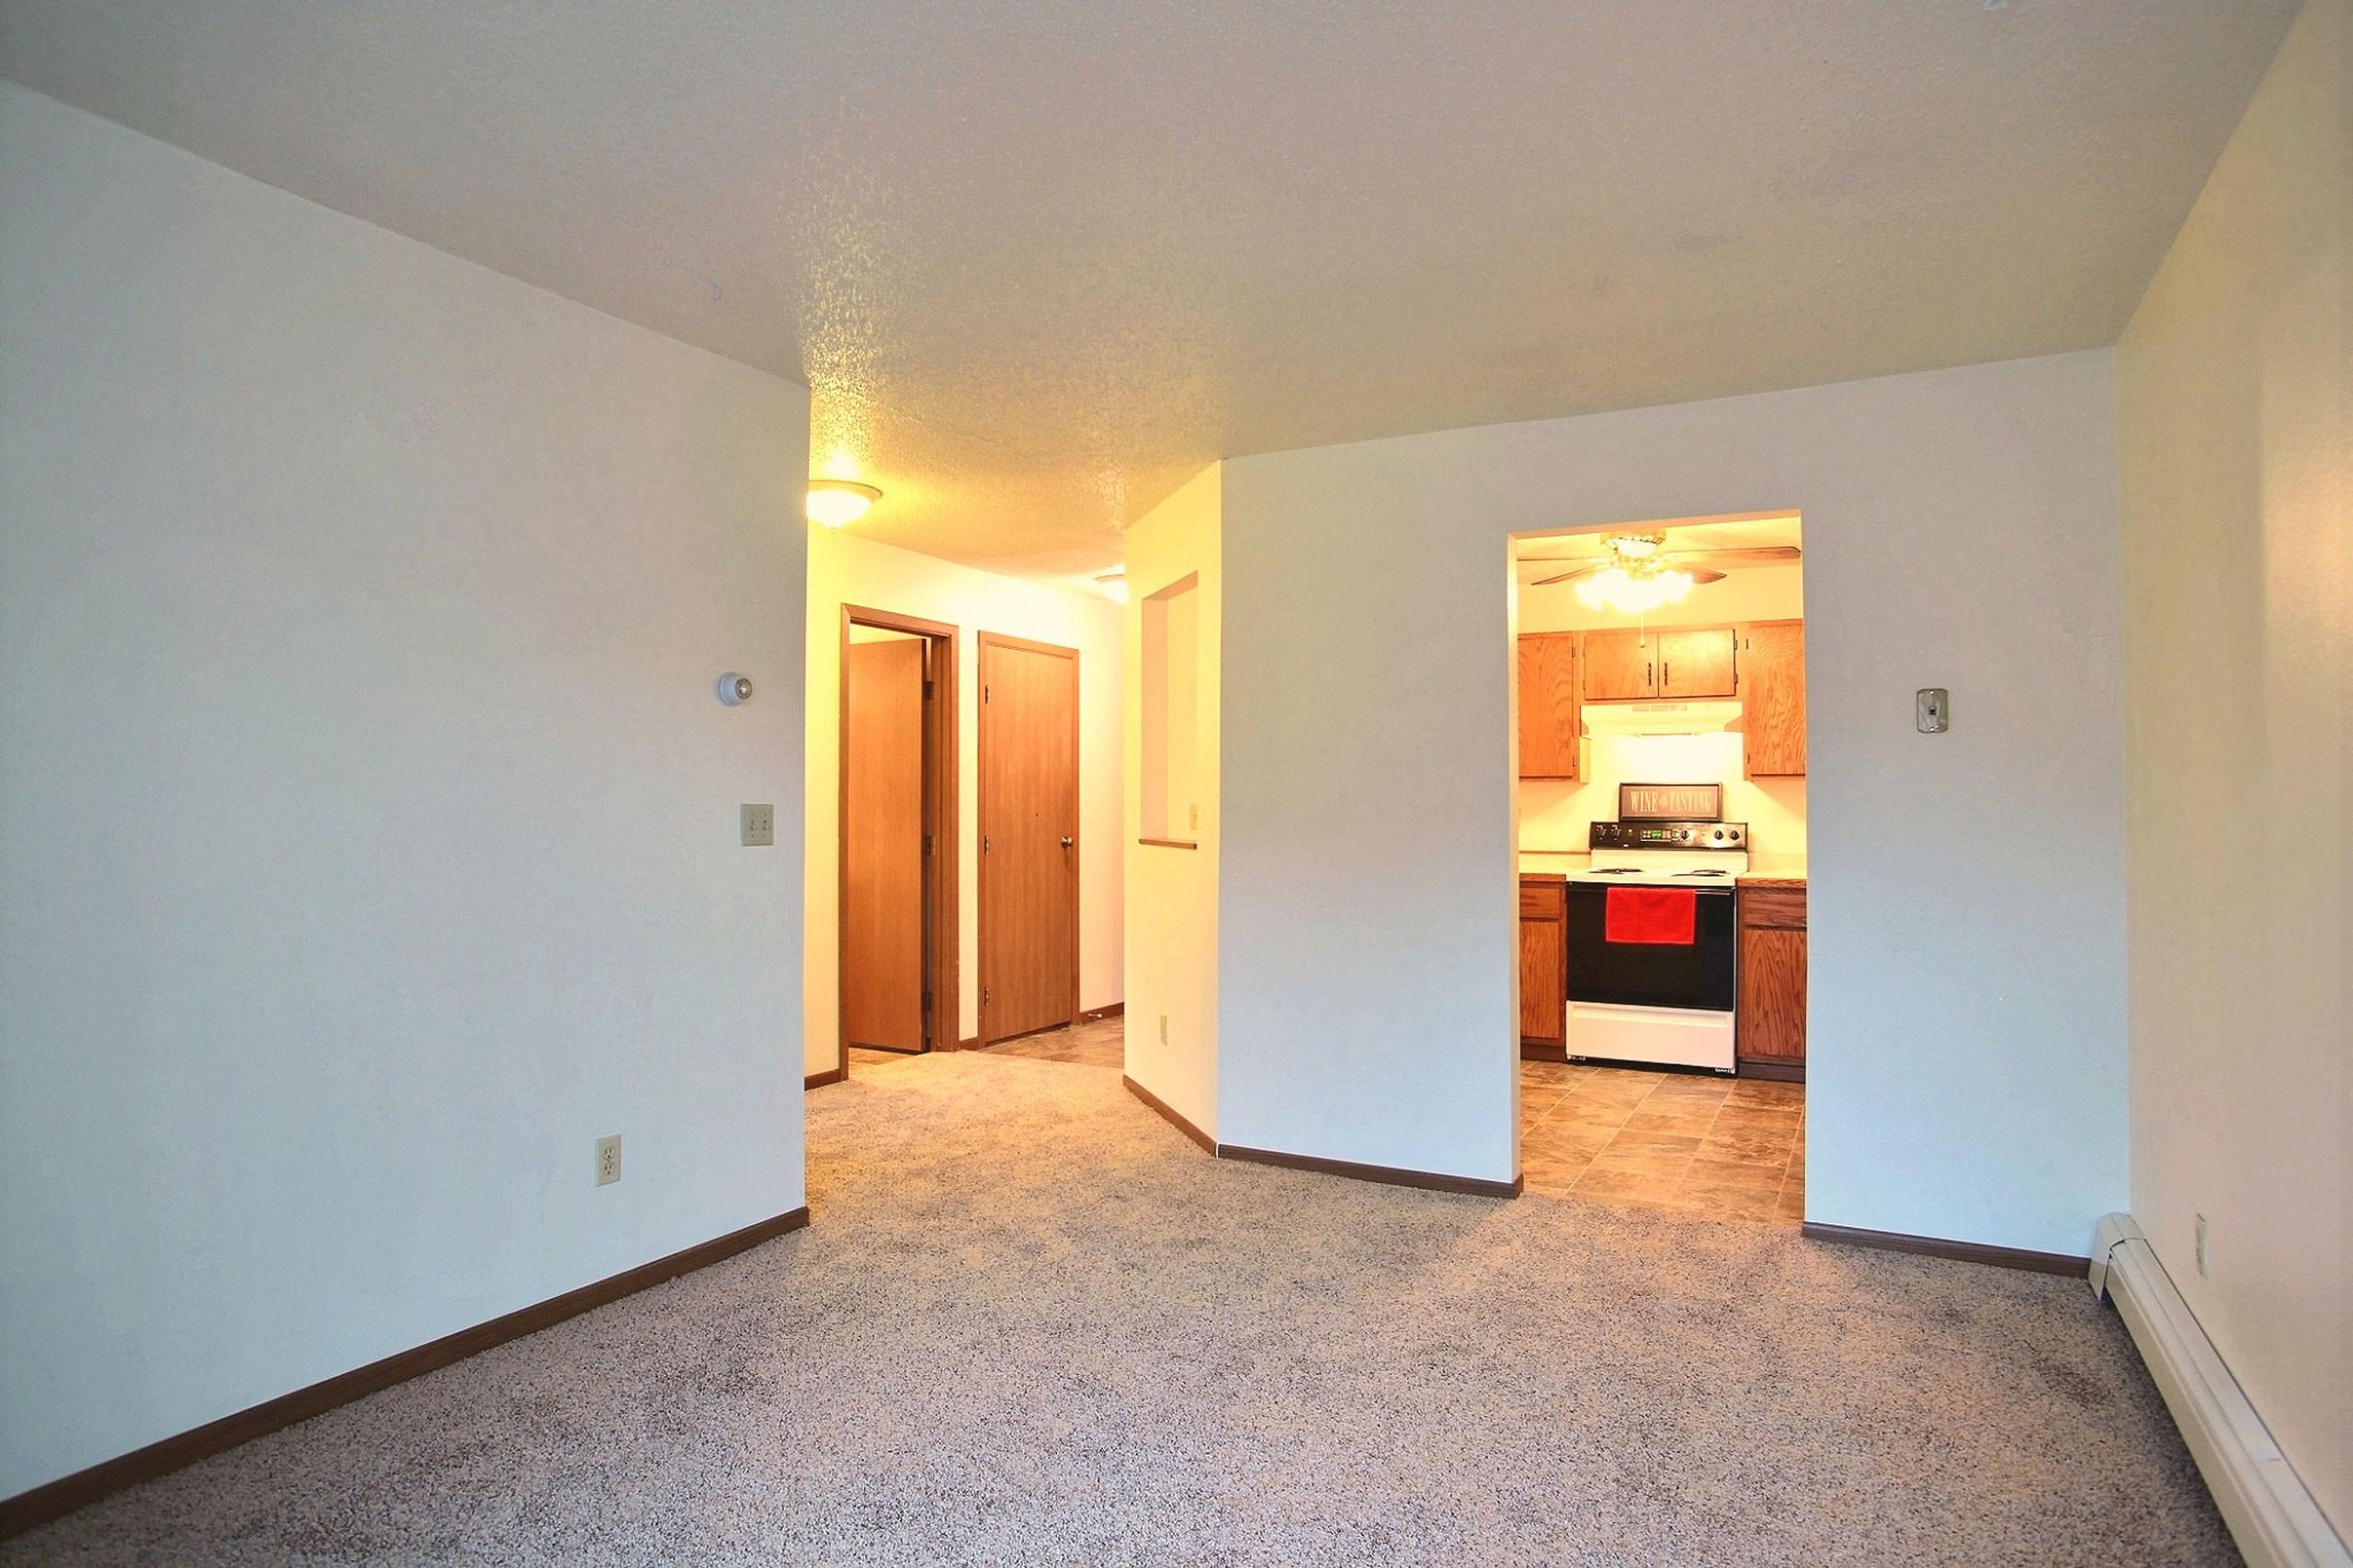 Westwood Estates Apartments | 1 Bdrm - Lvng Rm-Plan A